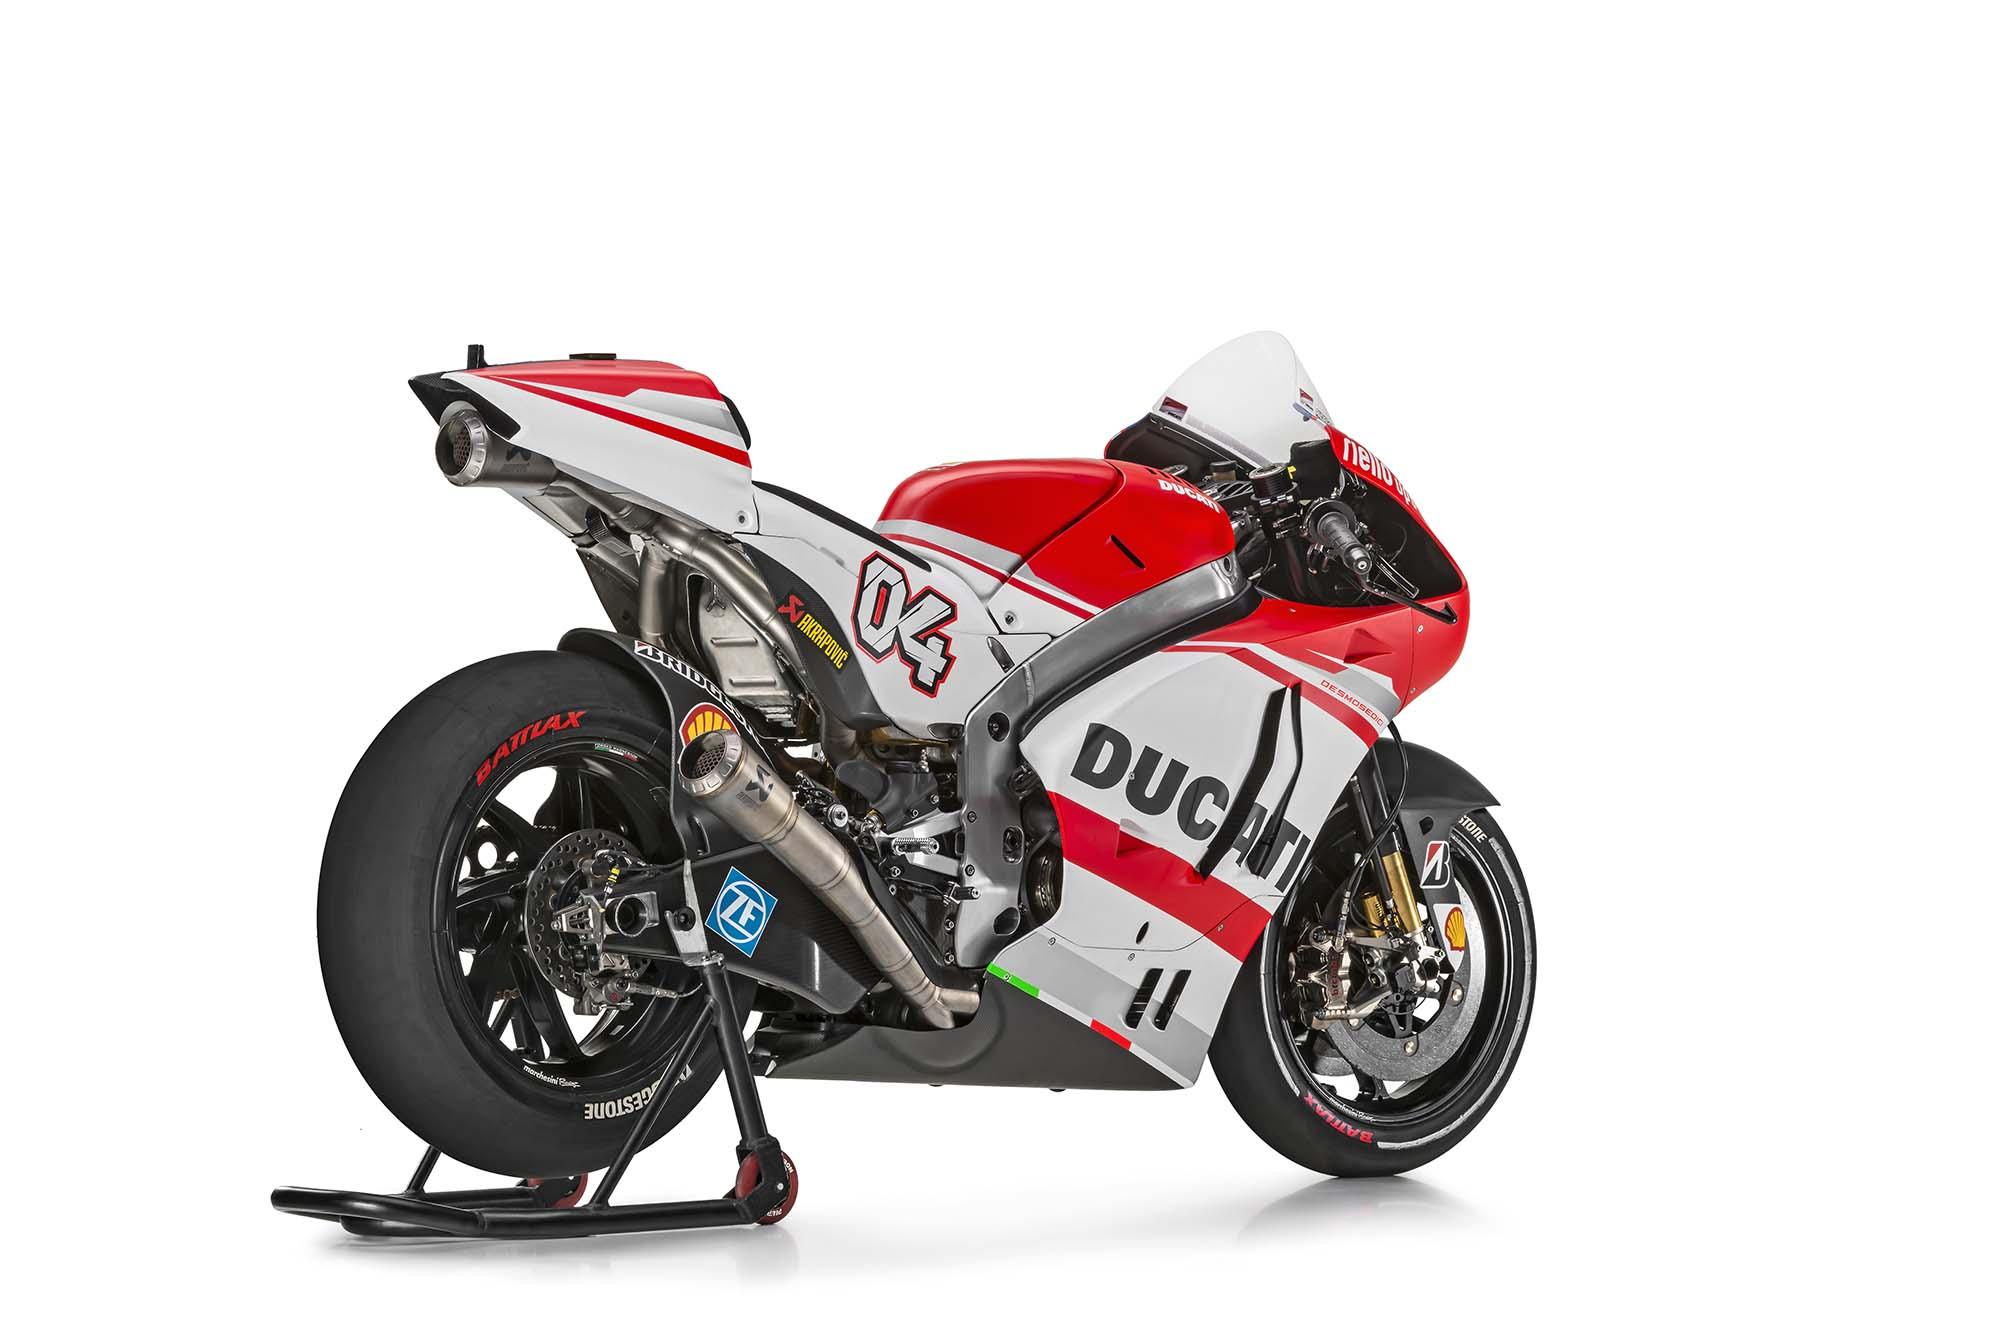 2014 Ducati Desmosedici GP14 Debuts in Germany - Asphalt & Rubber